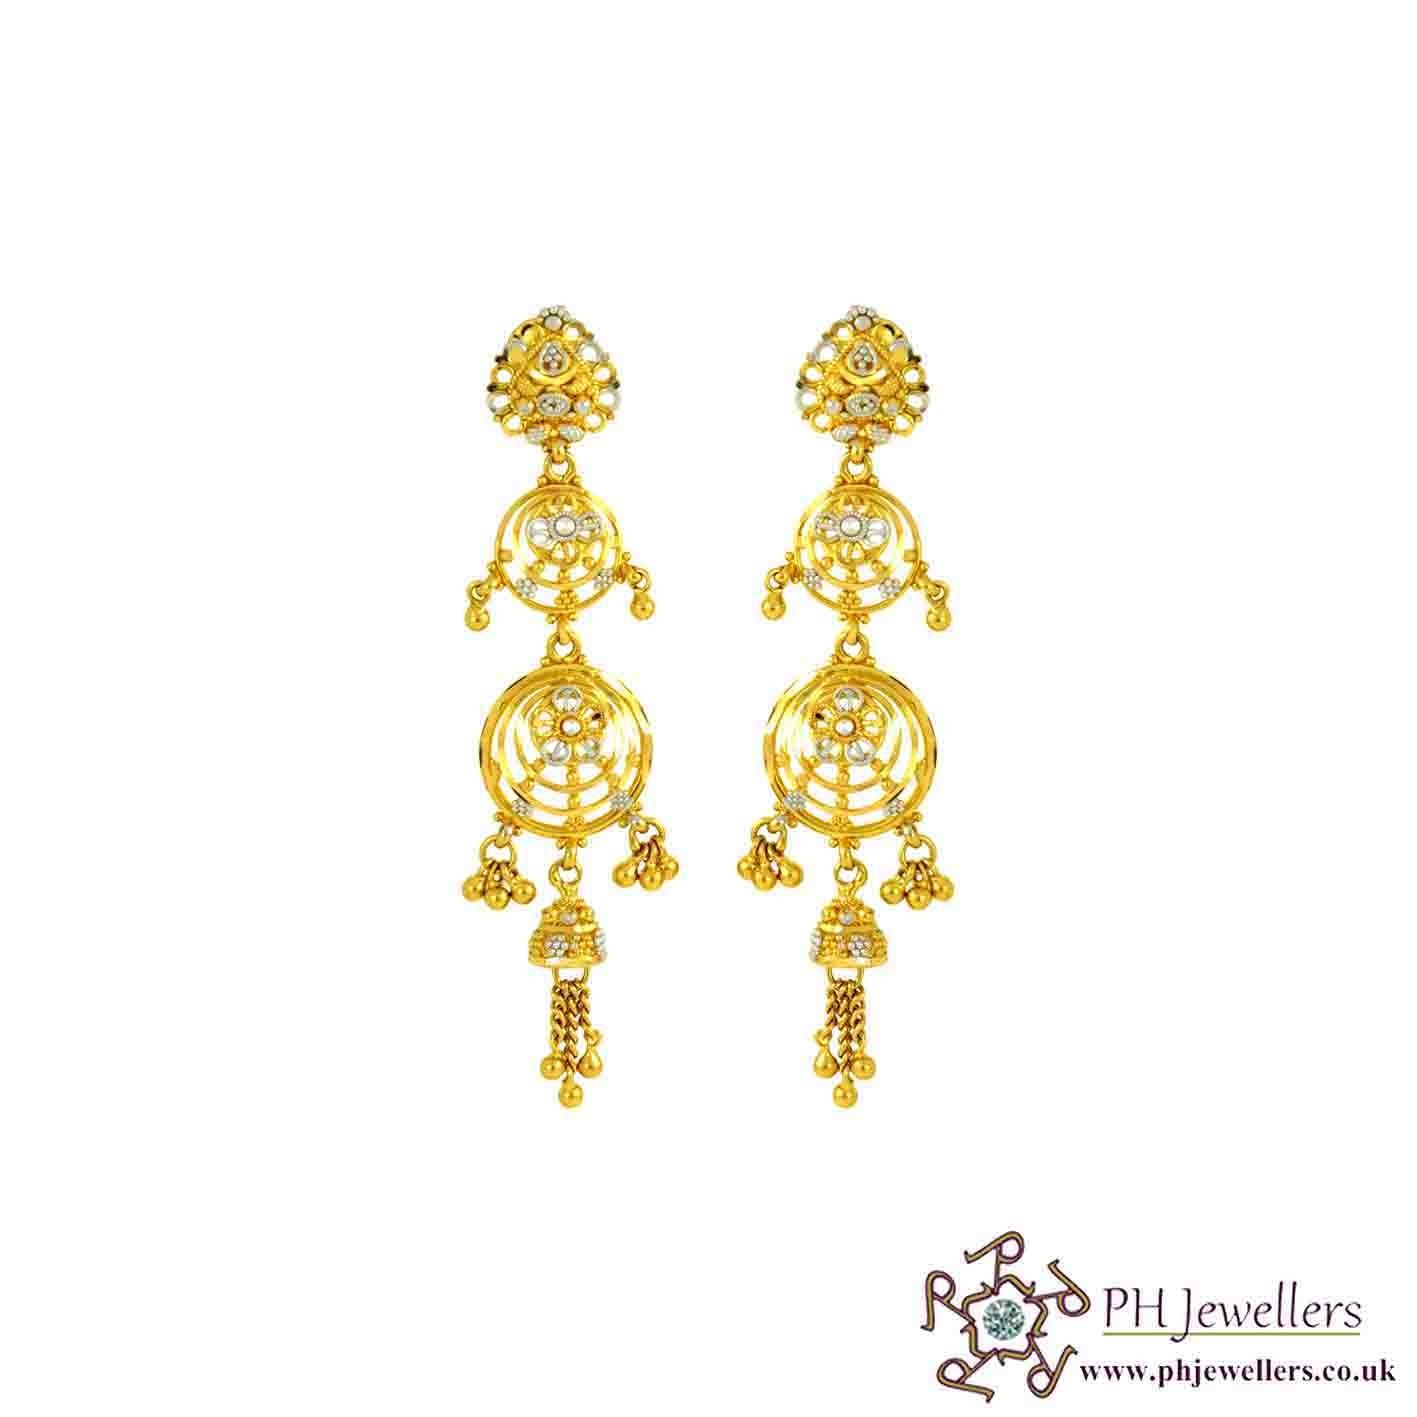 22ct 916 Hallmark Yellow Gold chandelier Earring LE28